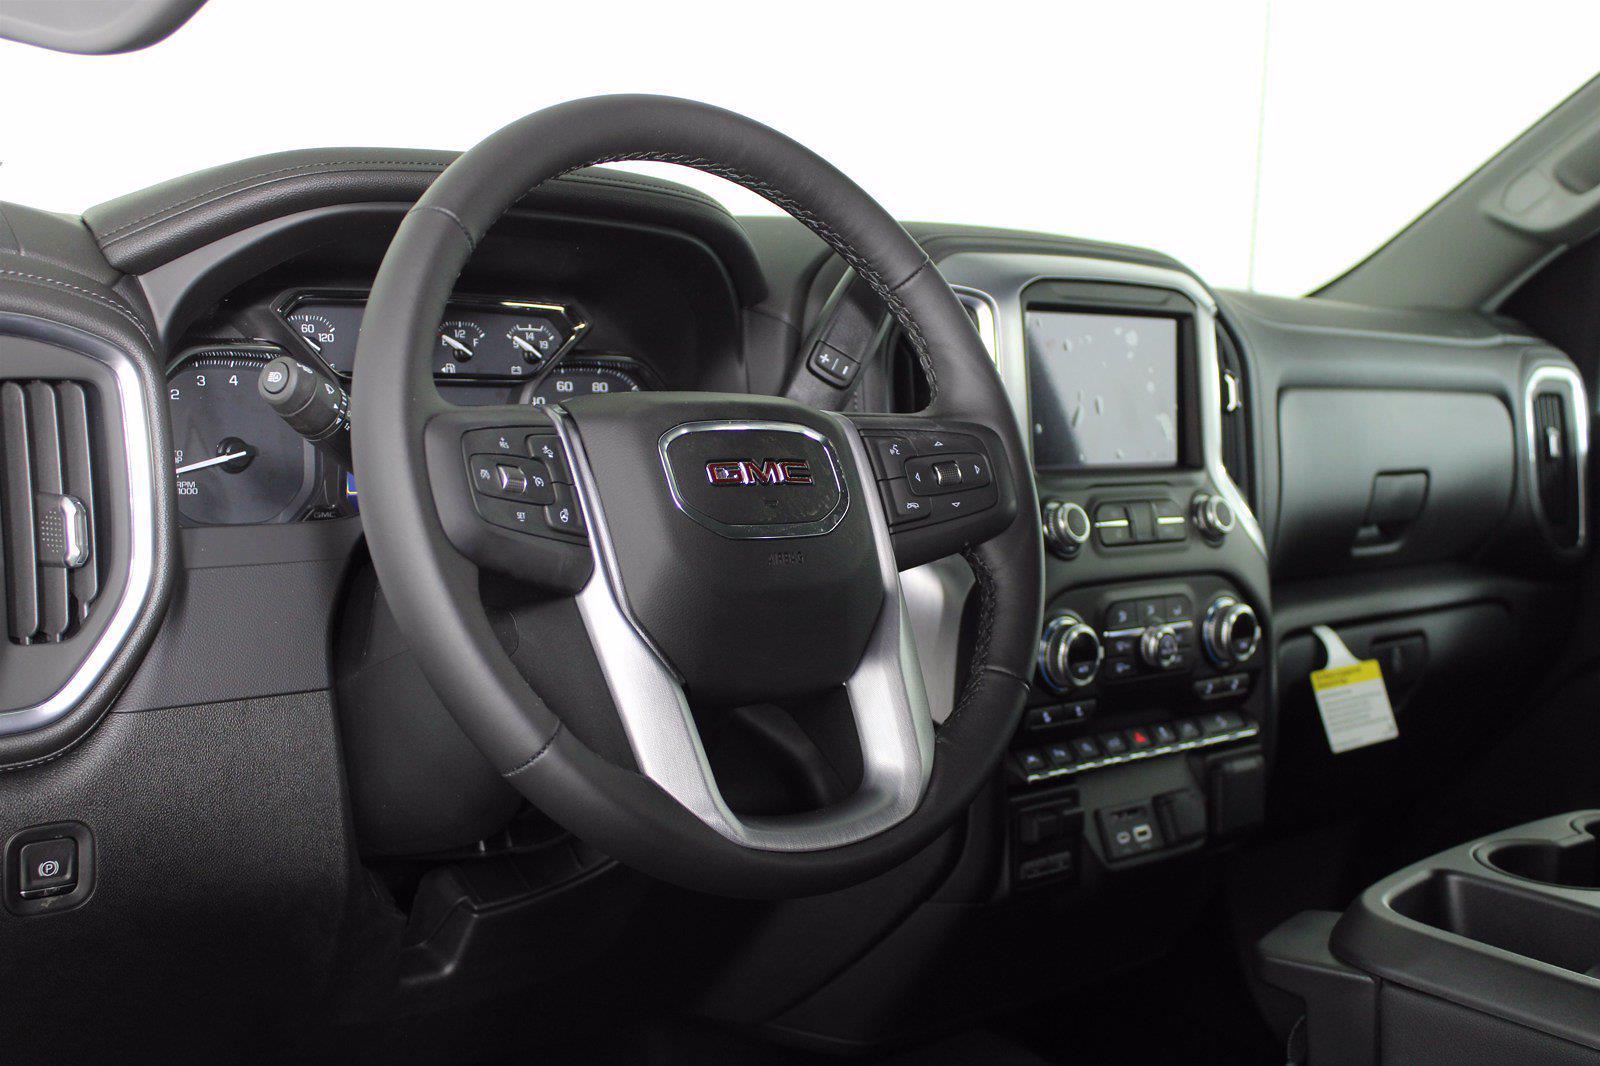 2021 GMC Sierra 1500 Crew Cab 4x4, Pickup #D410588 - photo 10